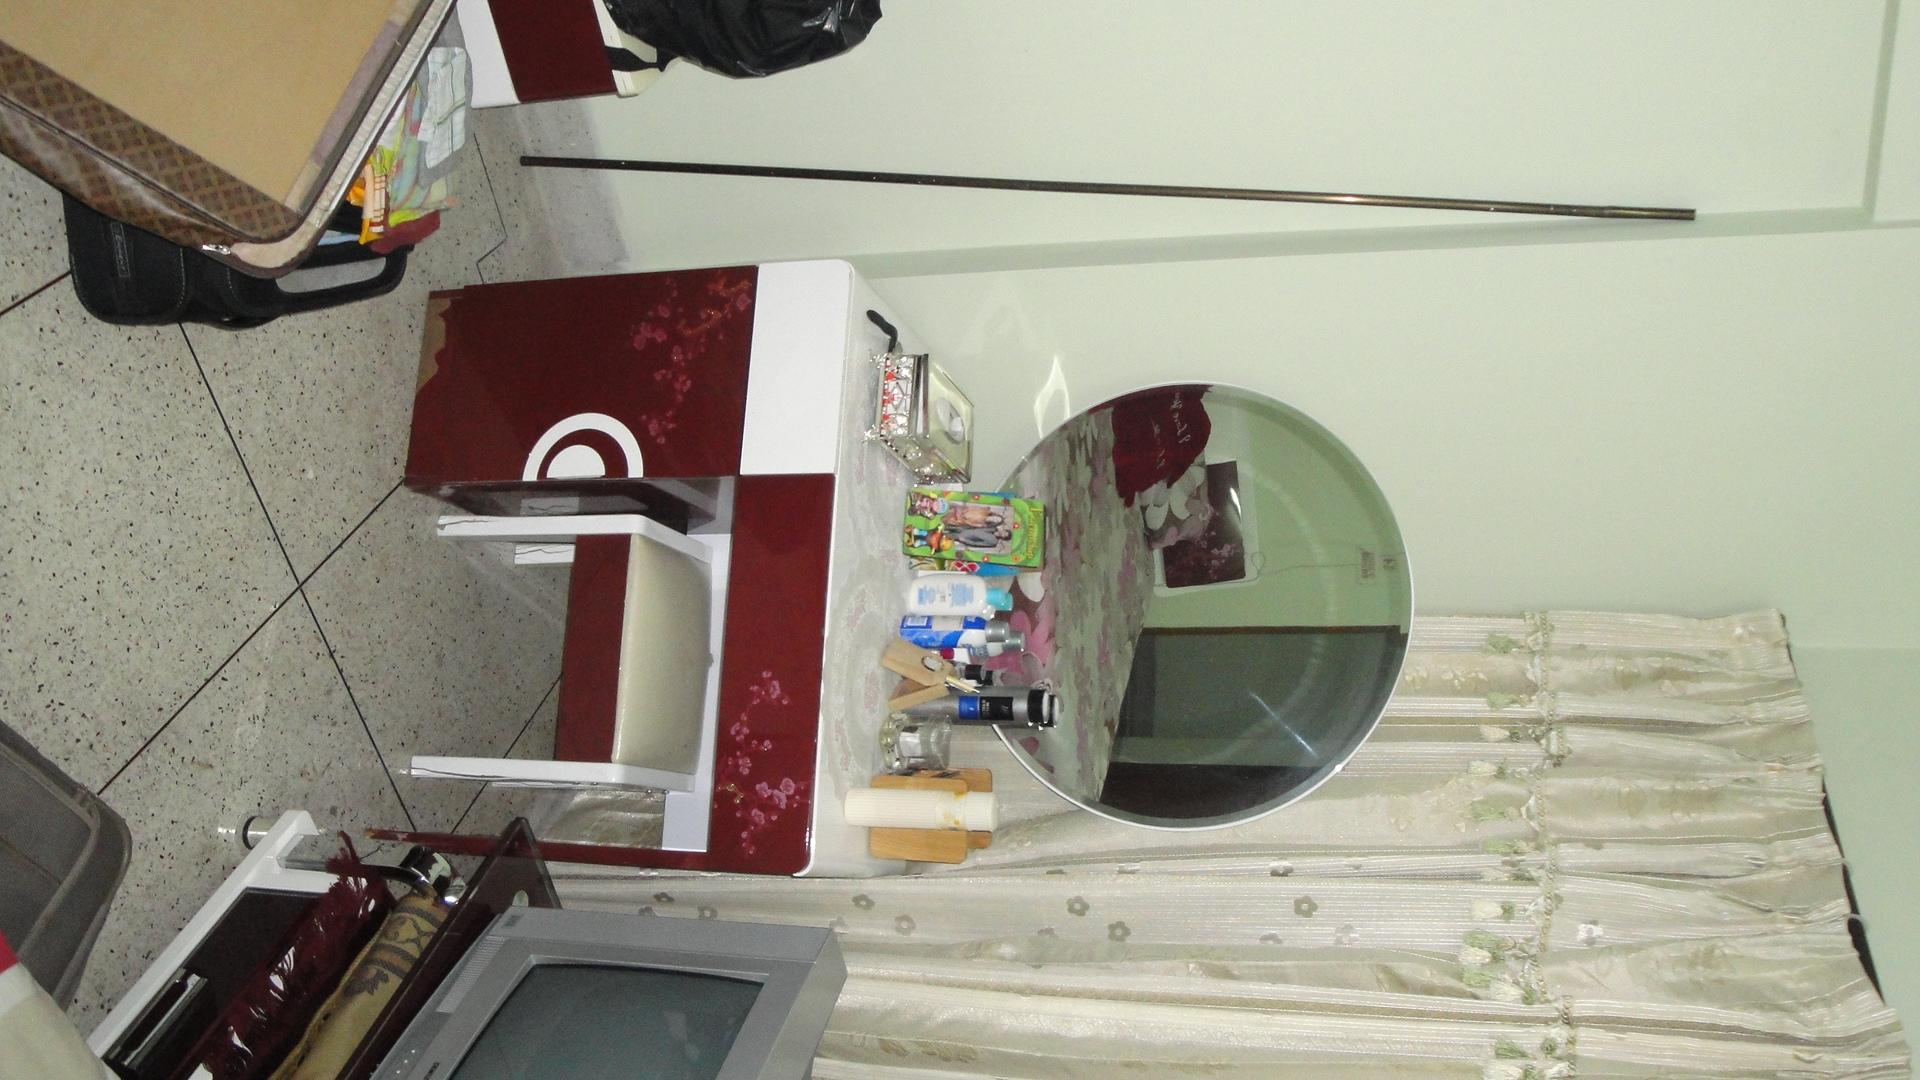 Sale - Imported Bed Room Set | ClickBD large image 1